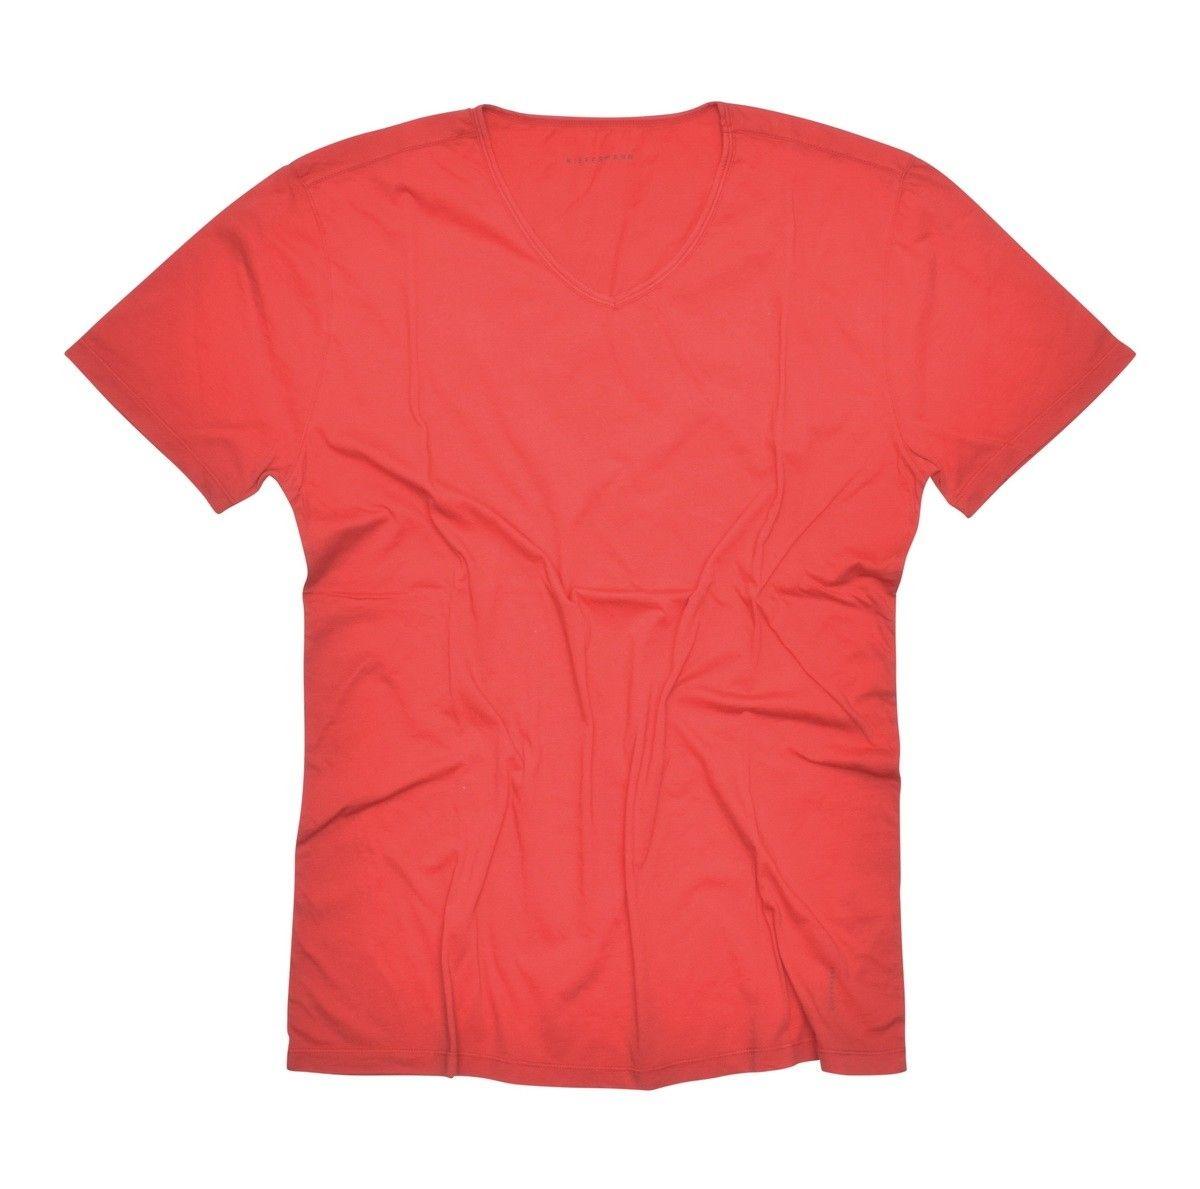 KIEFERMANN - Herren T-Shirt - DARIUS - Firey Red -